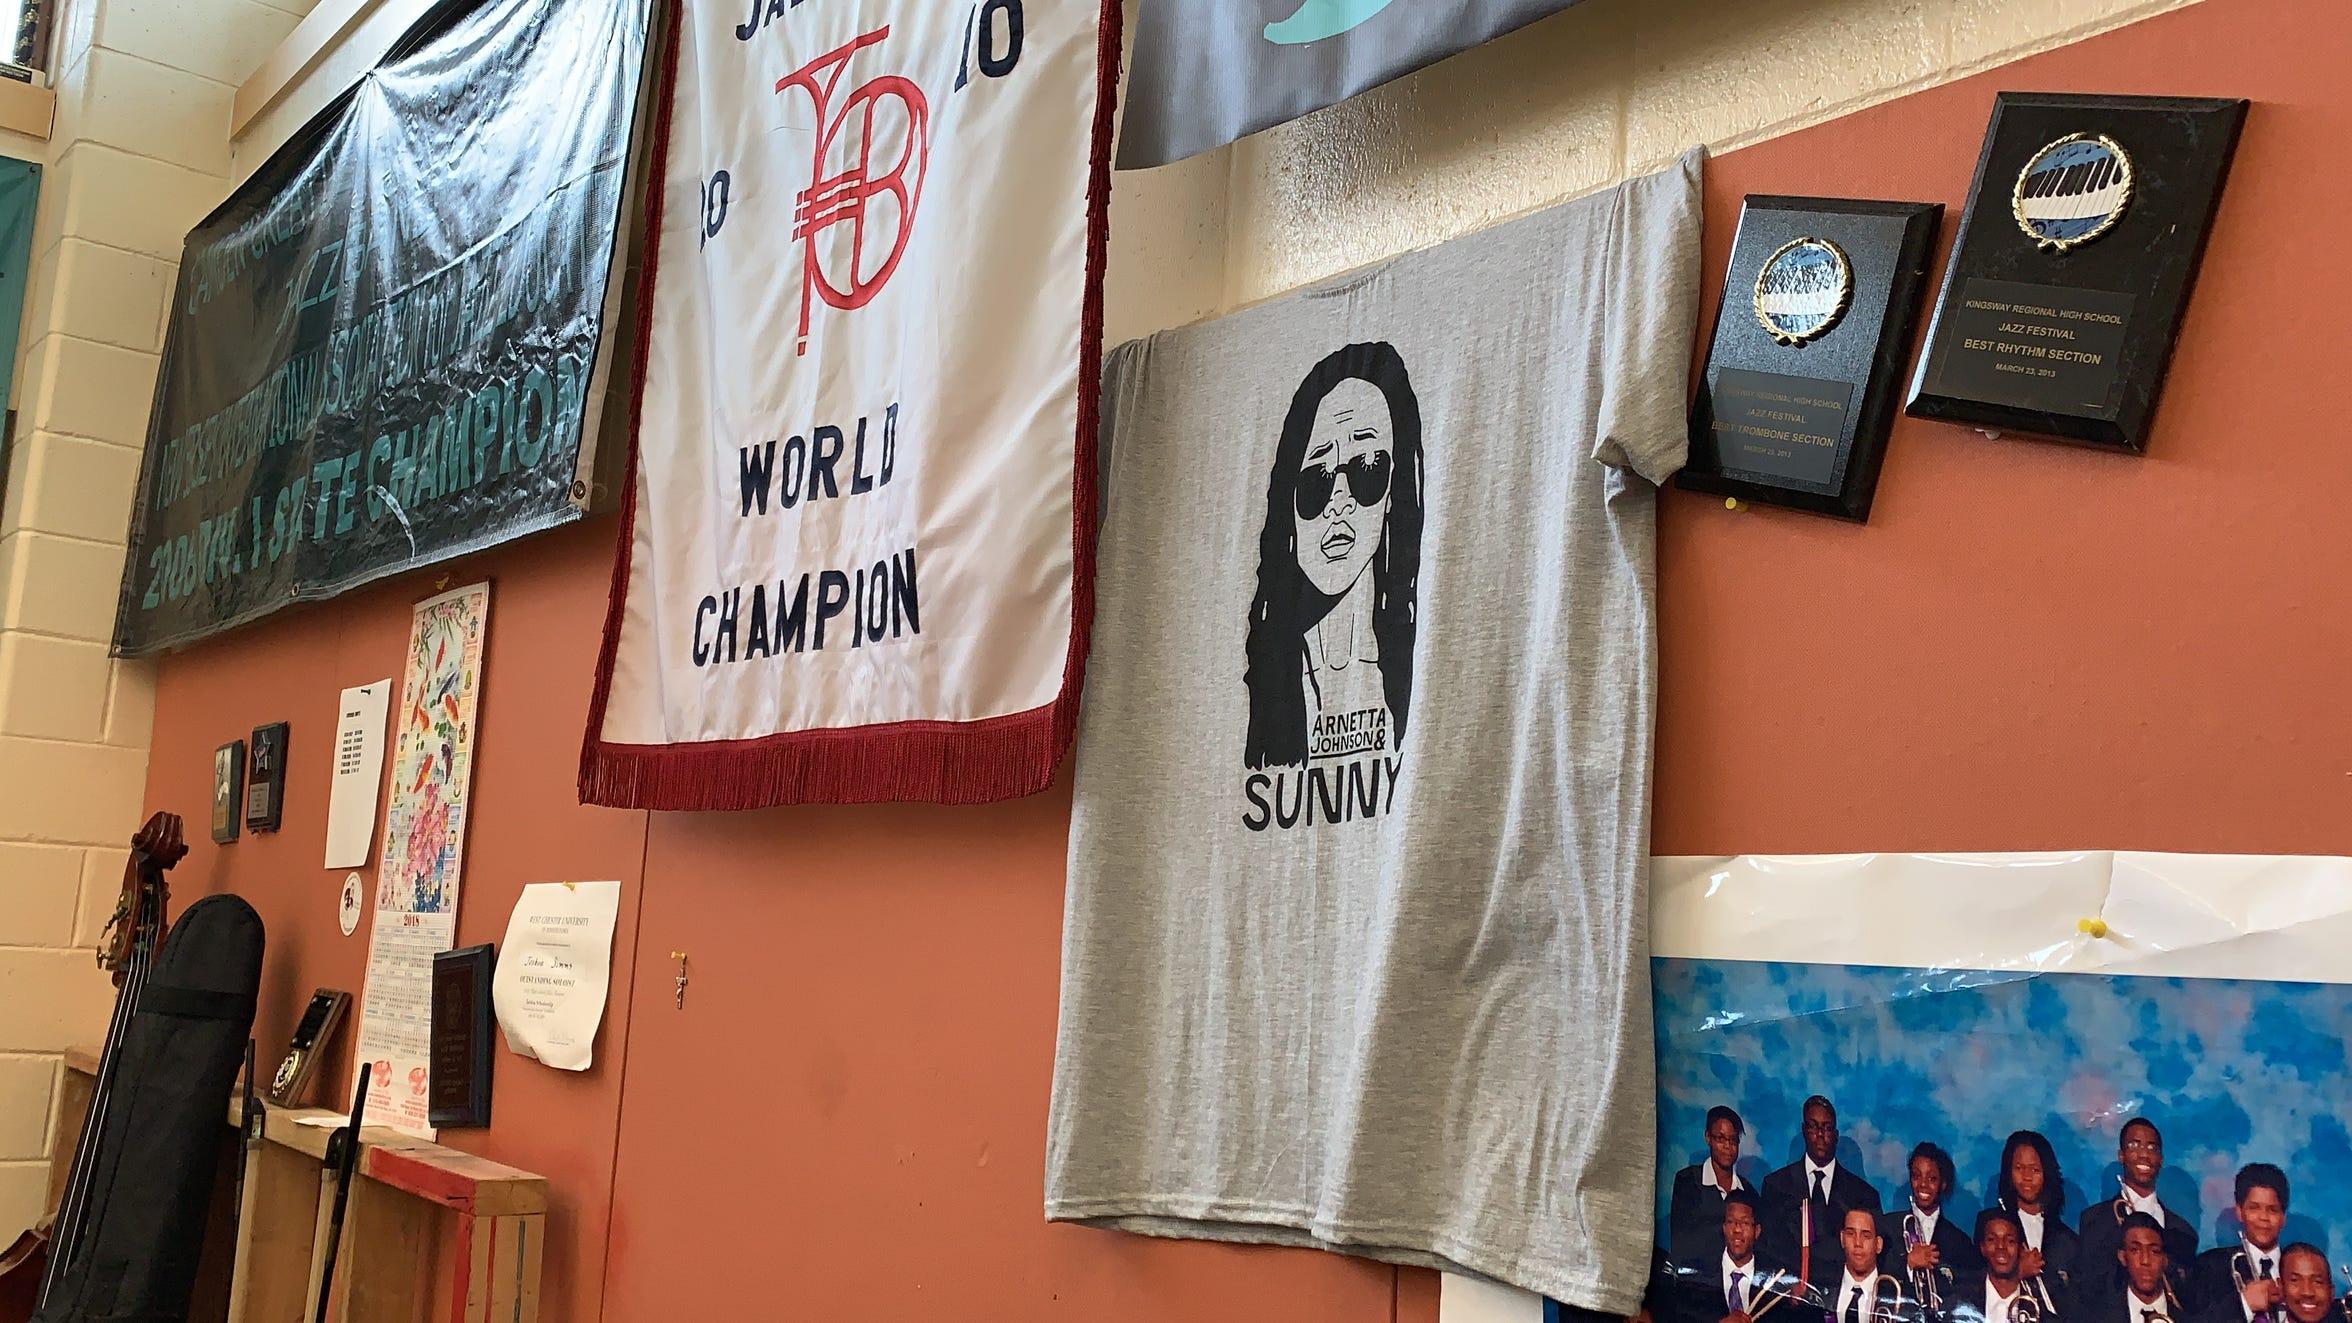 A t-shirt for Creative Arts Morgan Village Academy alumnus Arnetta Johnson's band Arnetta Johnson & Sunny hangs in the high school's band room where she spent countless hours rehearsing.